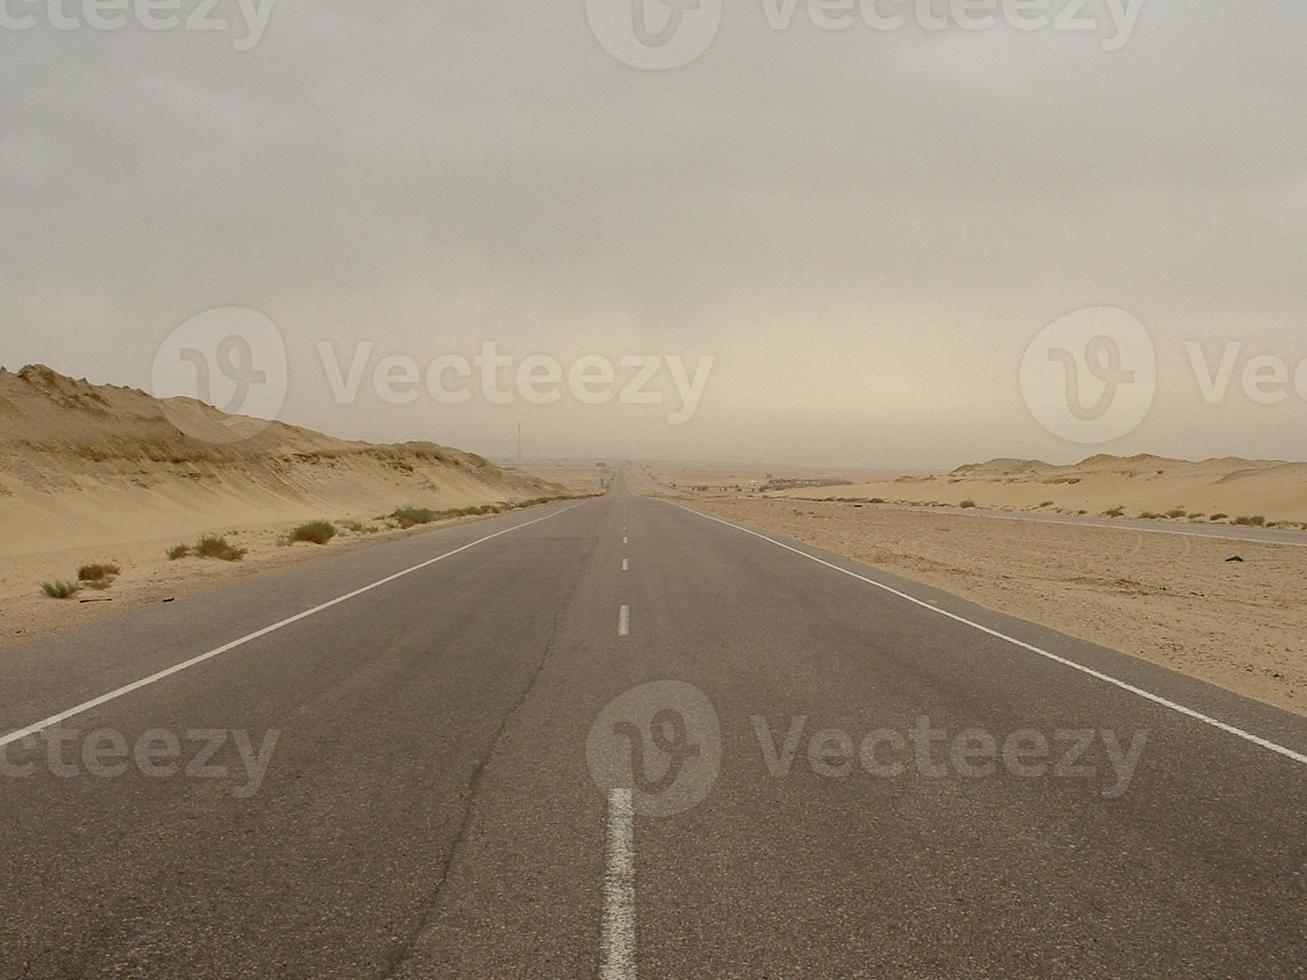 alamein väg mitt i en sandstorm foto